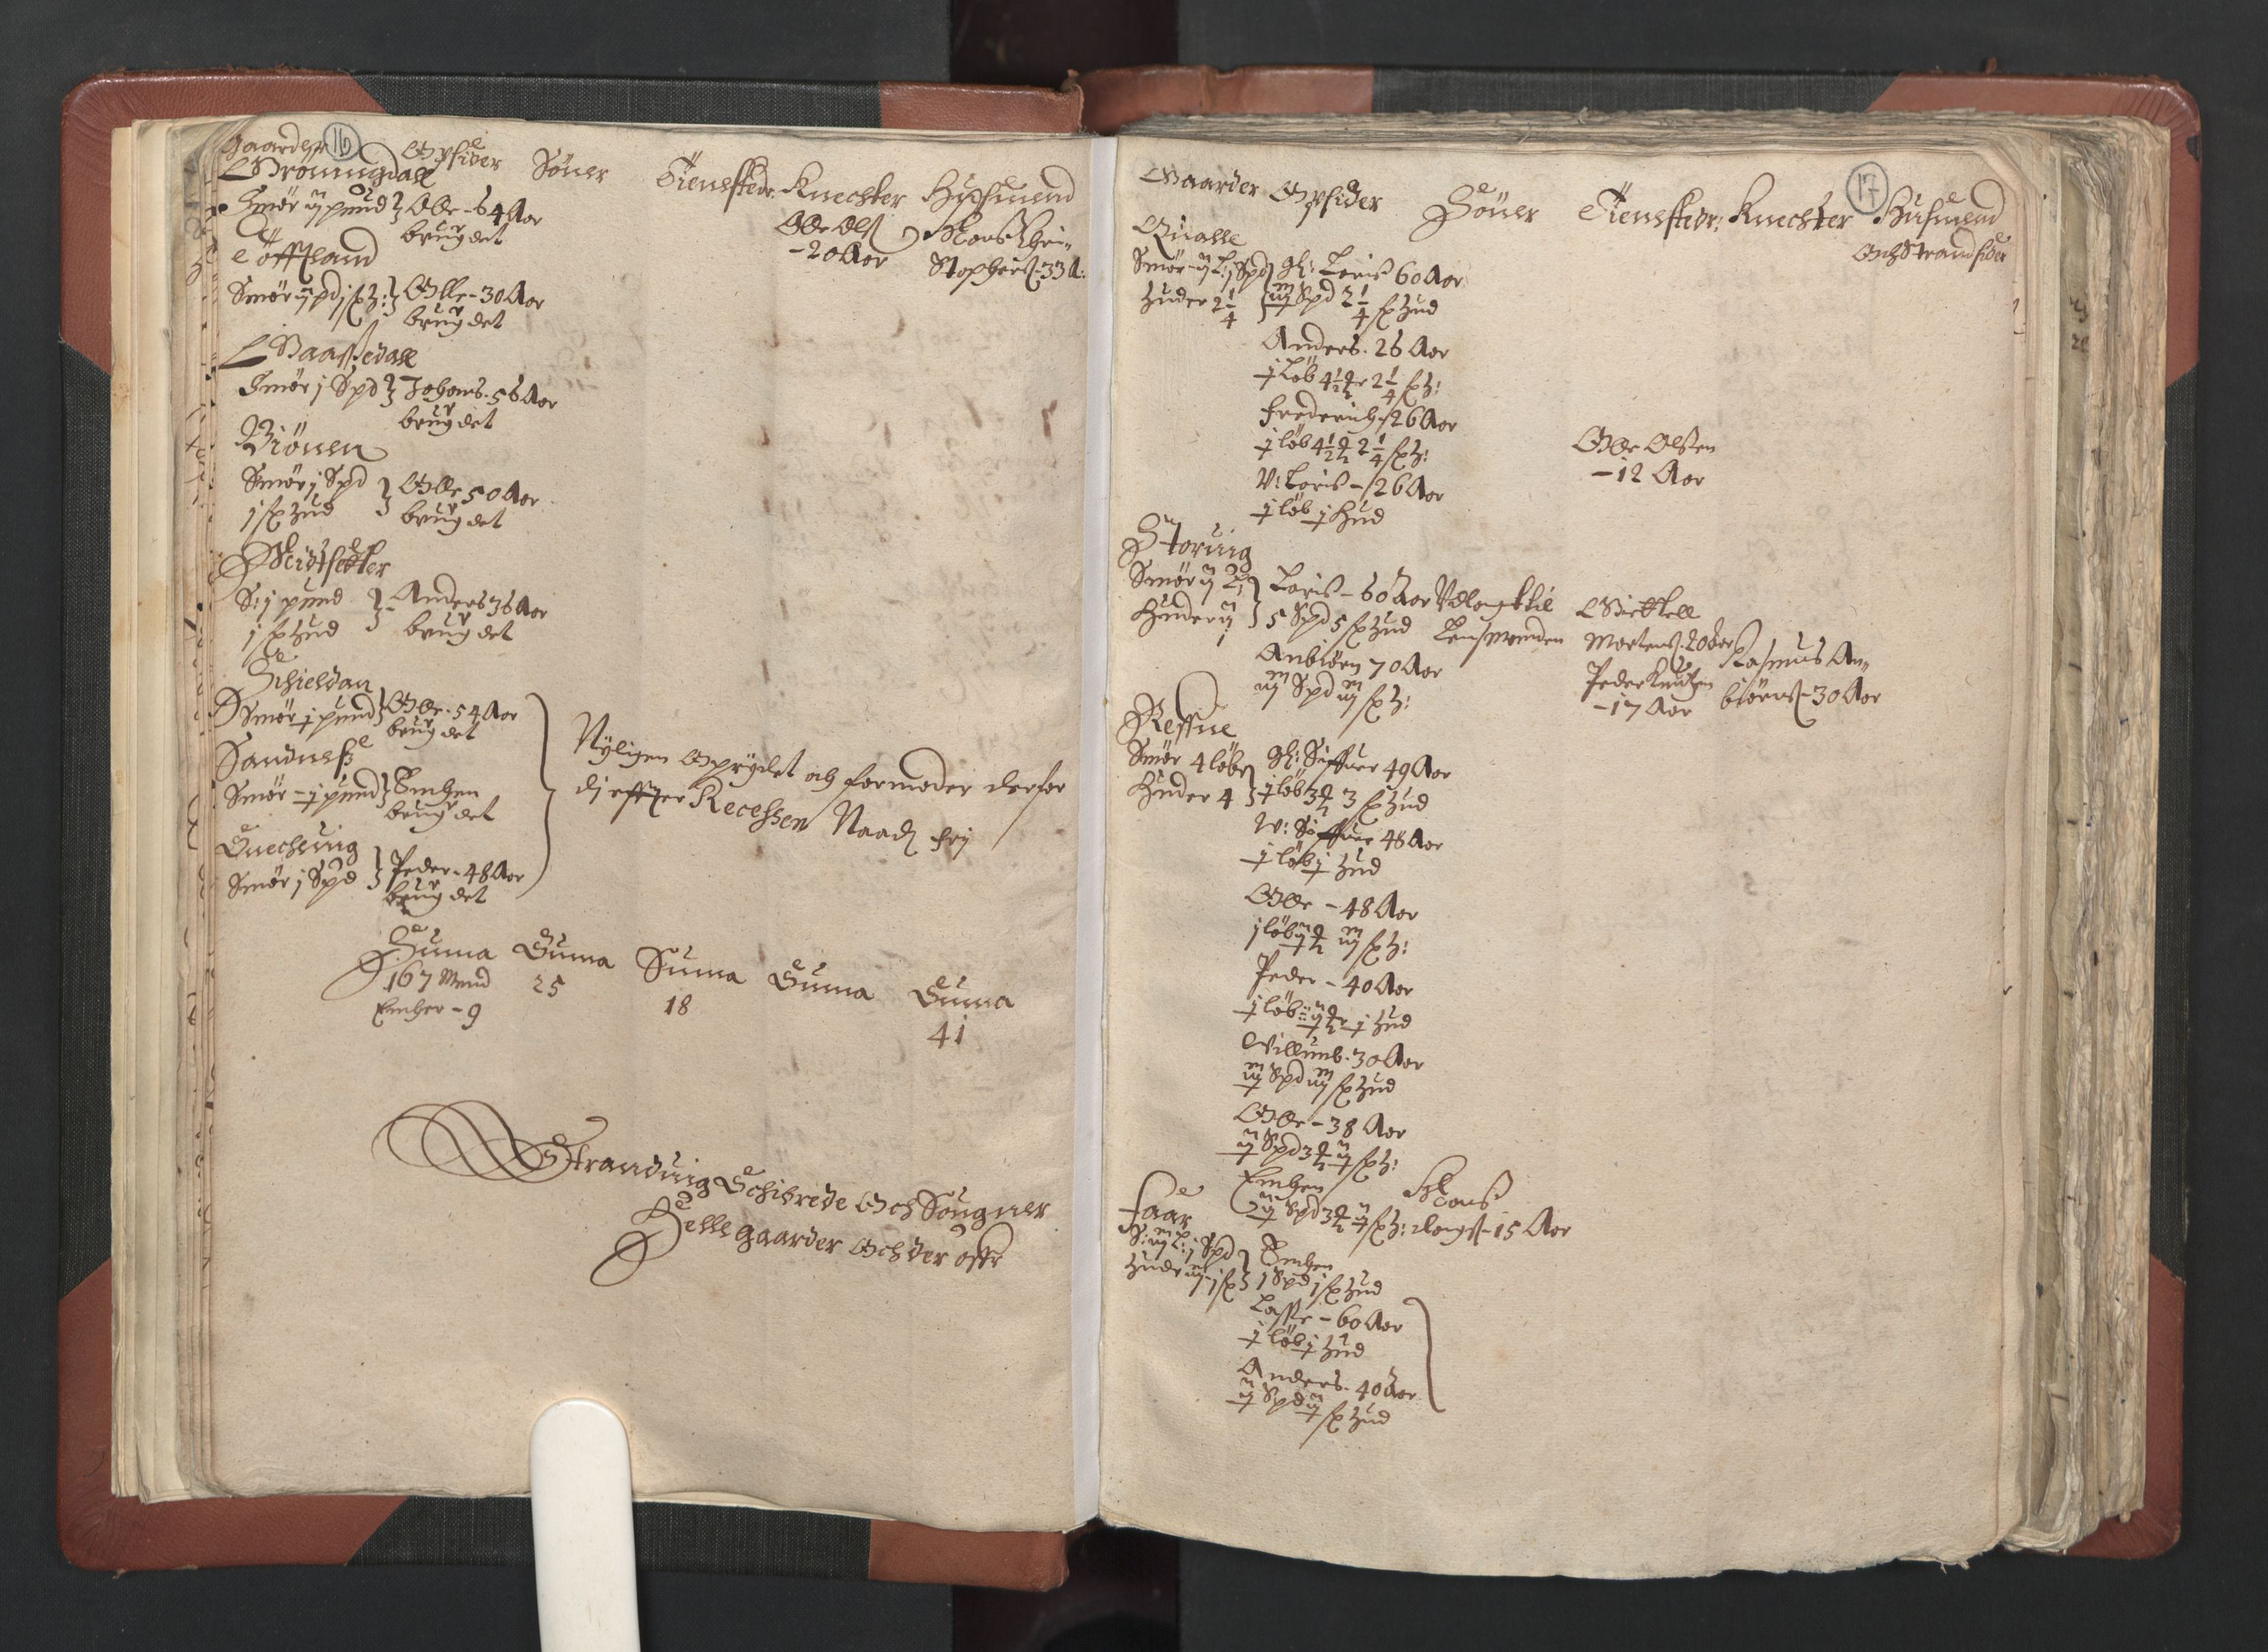 RA, Fogdenes og sorenskrivernes manntall 1664-1666, nr. 13: Nordhordland fogderi og Sunnhordland fogderi, 1665, s. 16-17